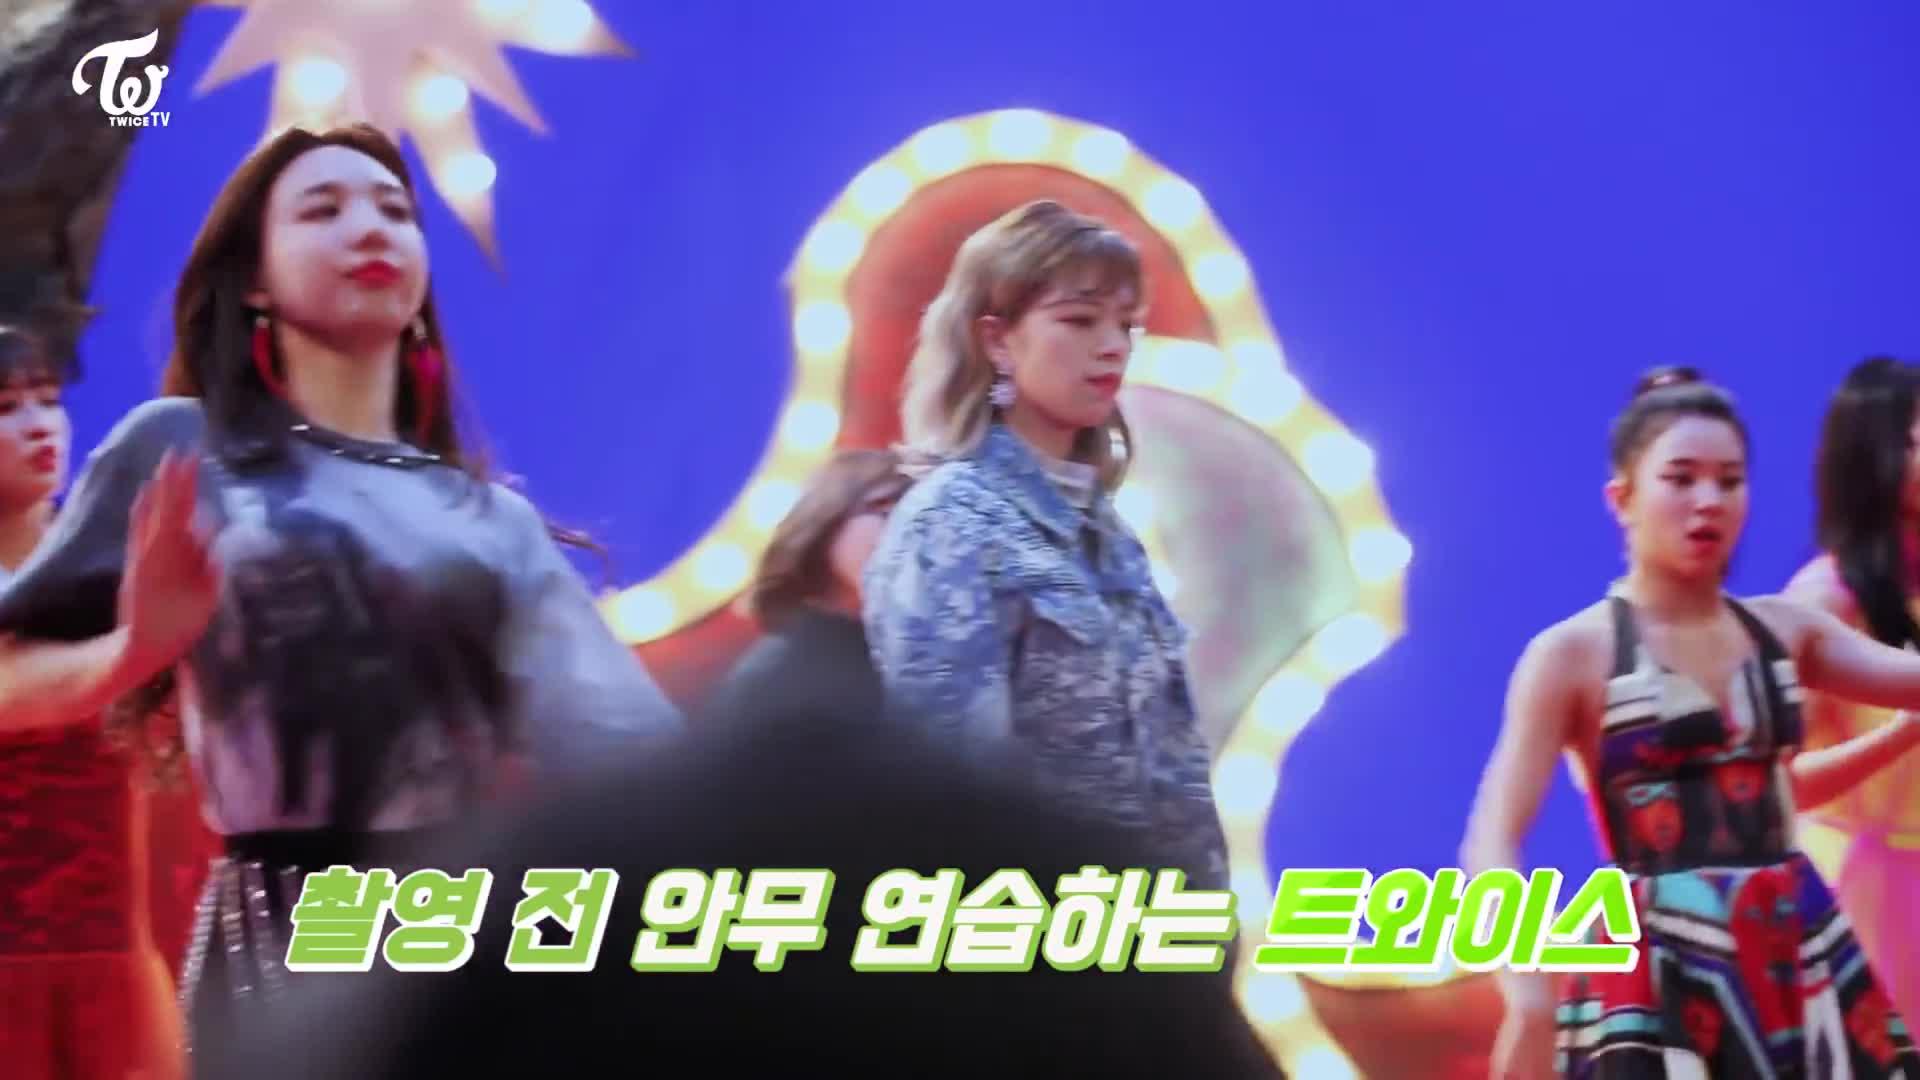 jeongyeon, kpop, twice, Jeongyeon,Chaeyoung GIFs